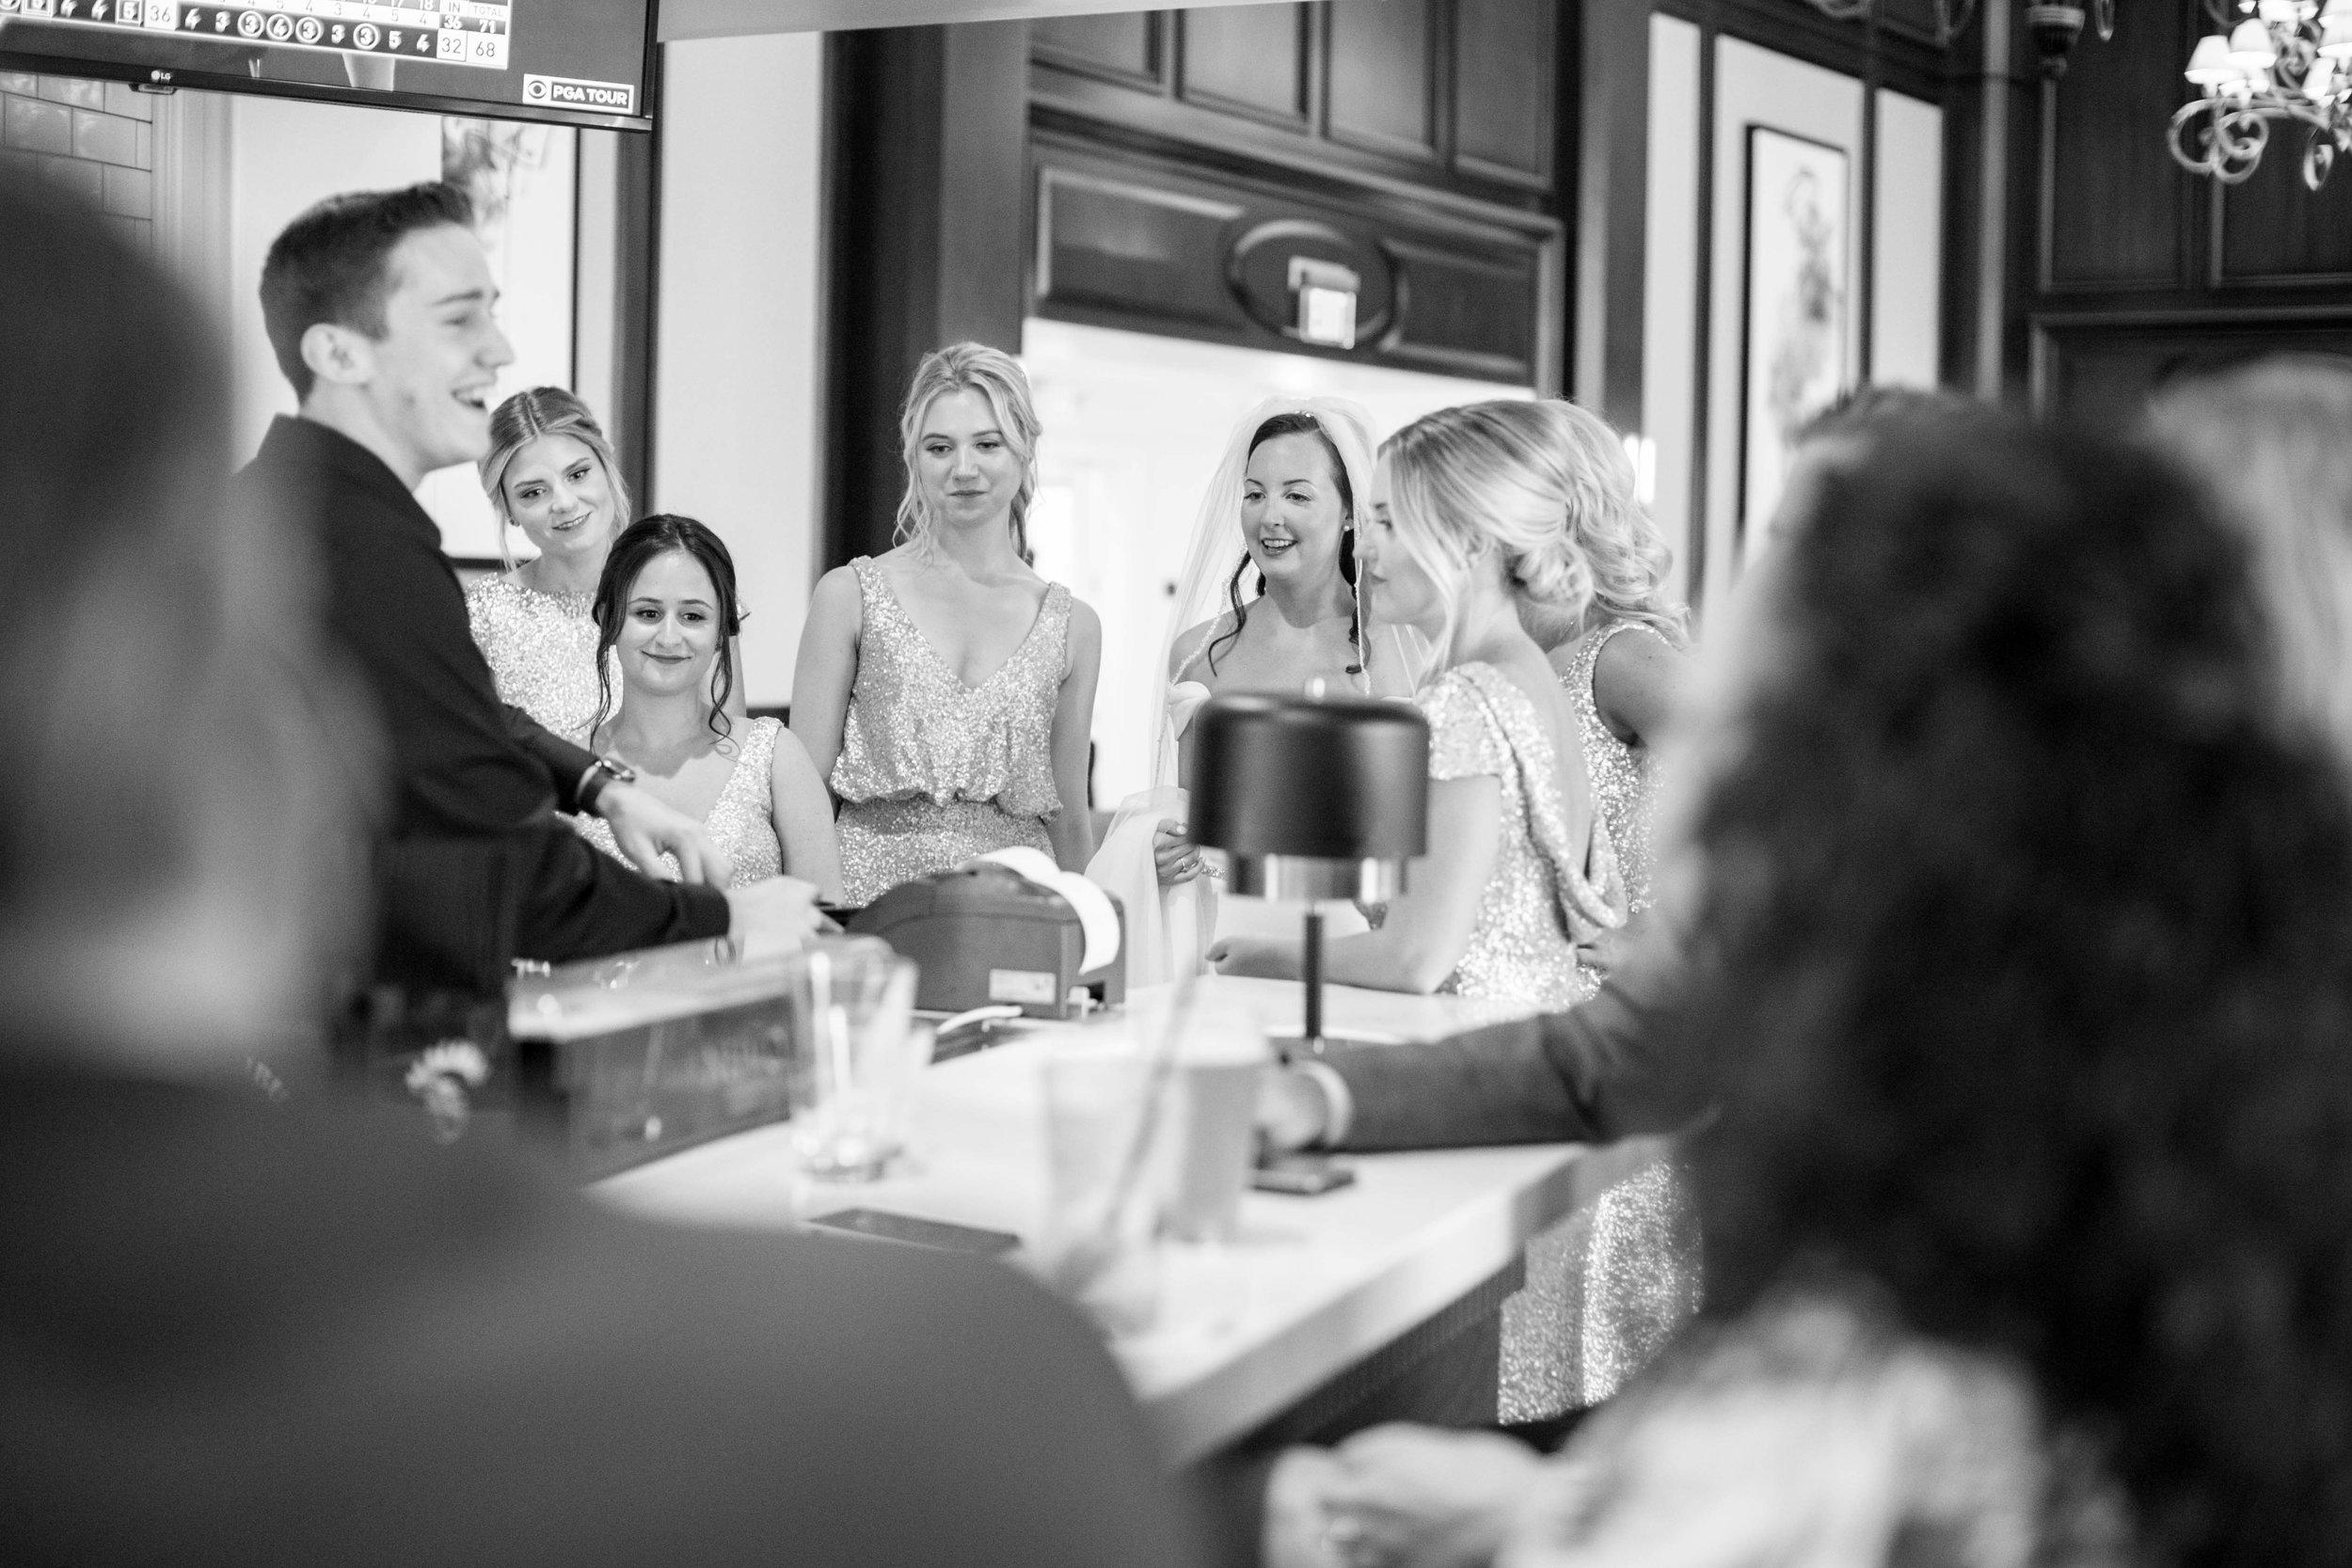 nelson-atkins-wedding-12.jpg